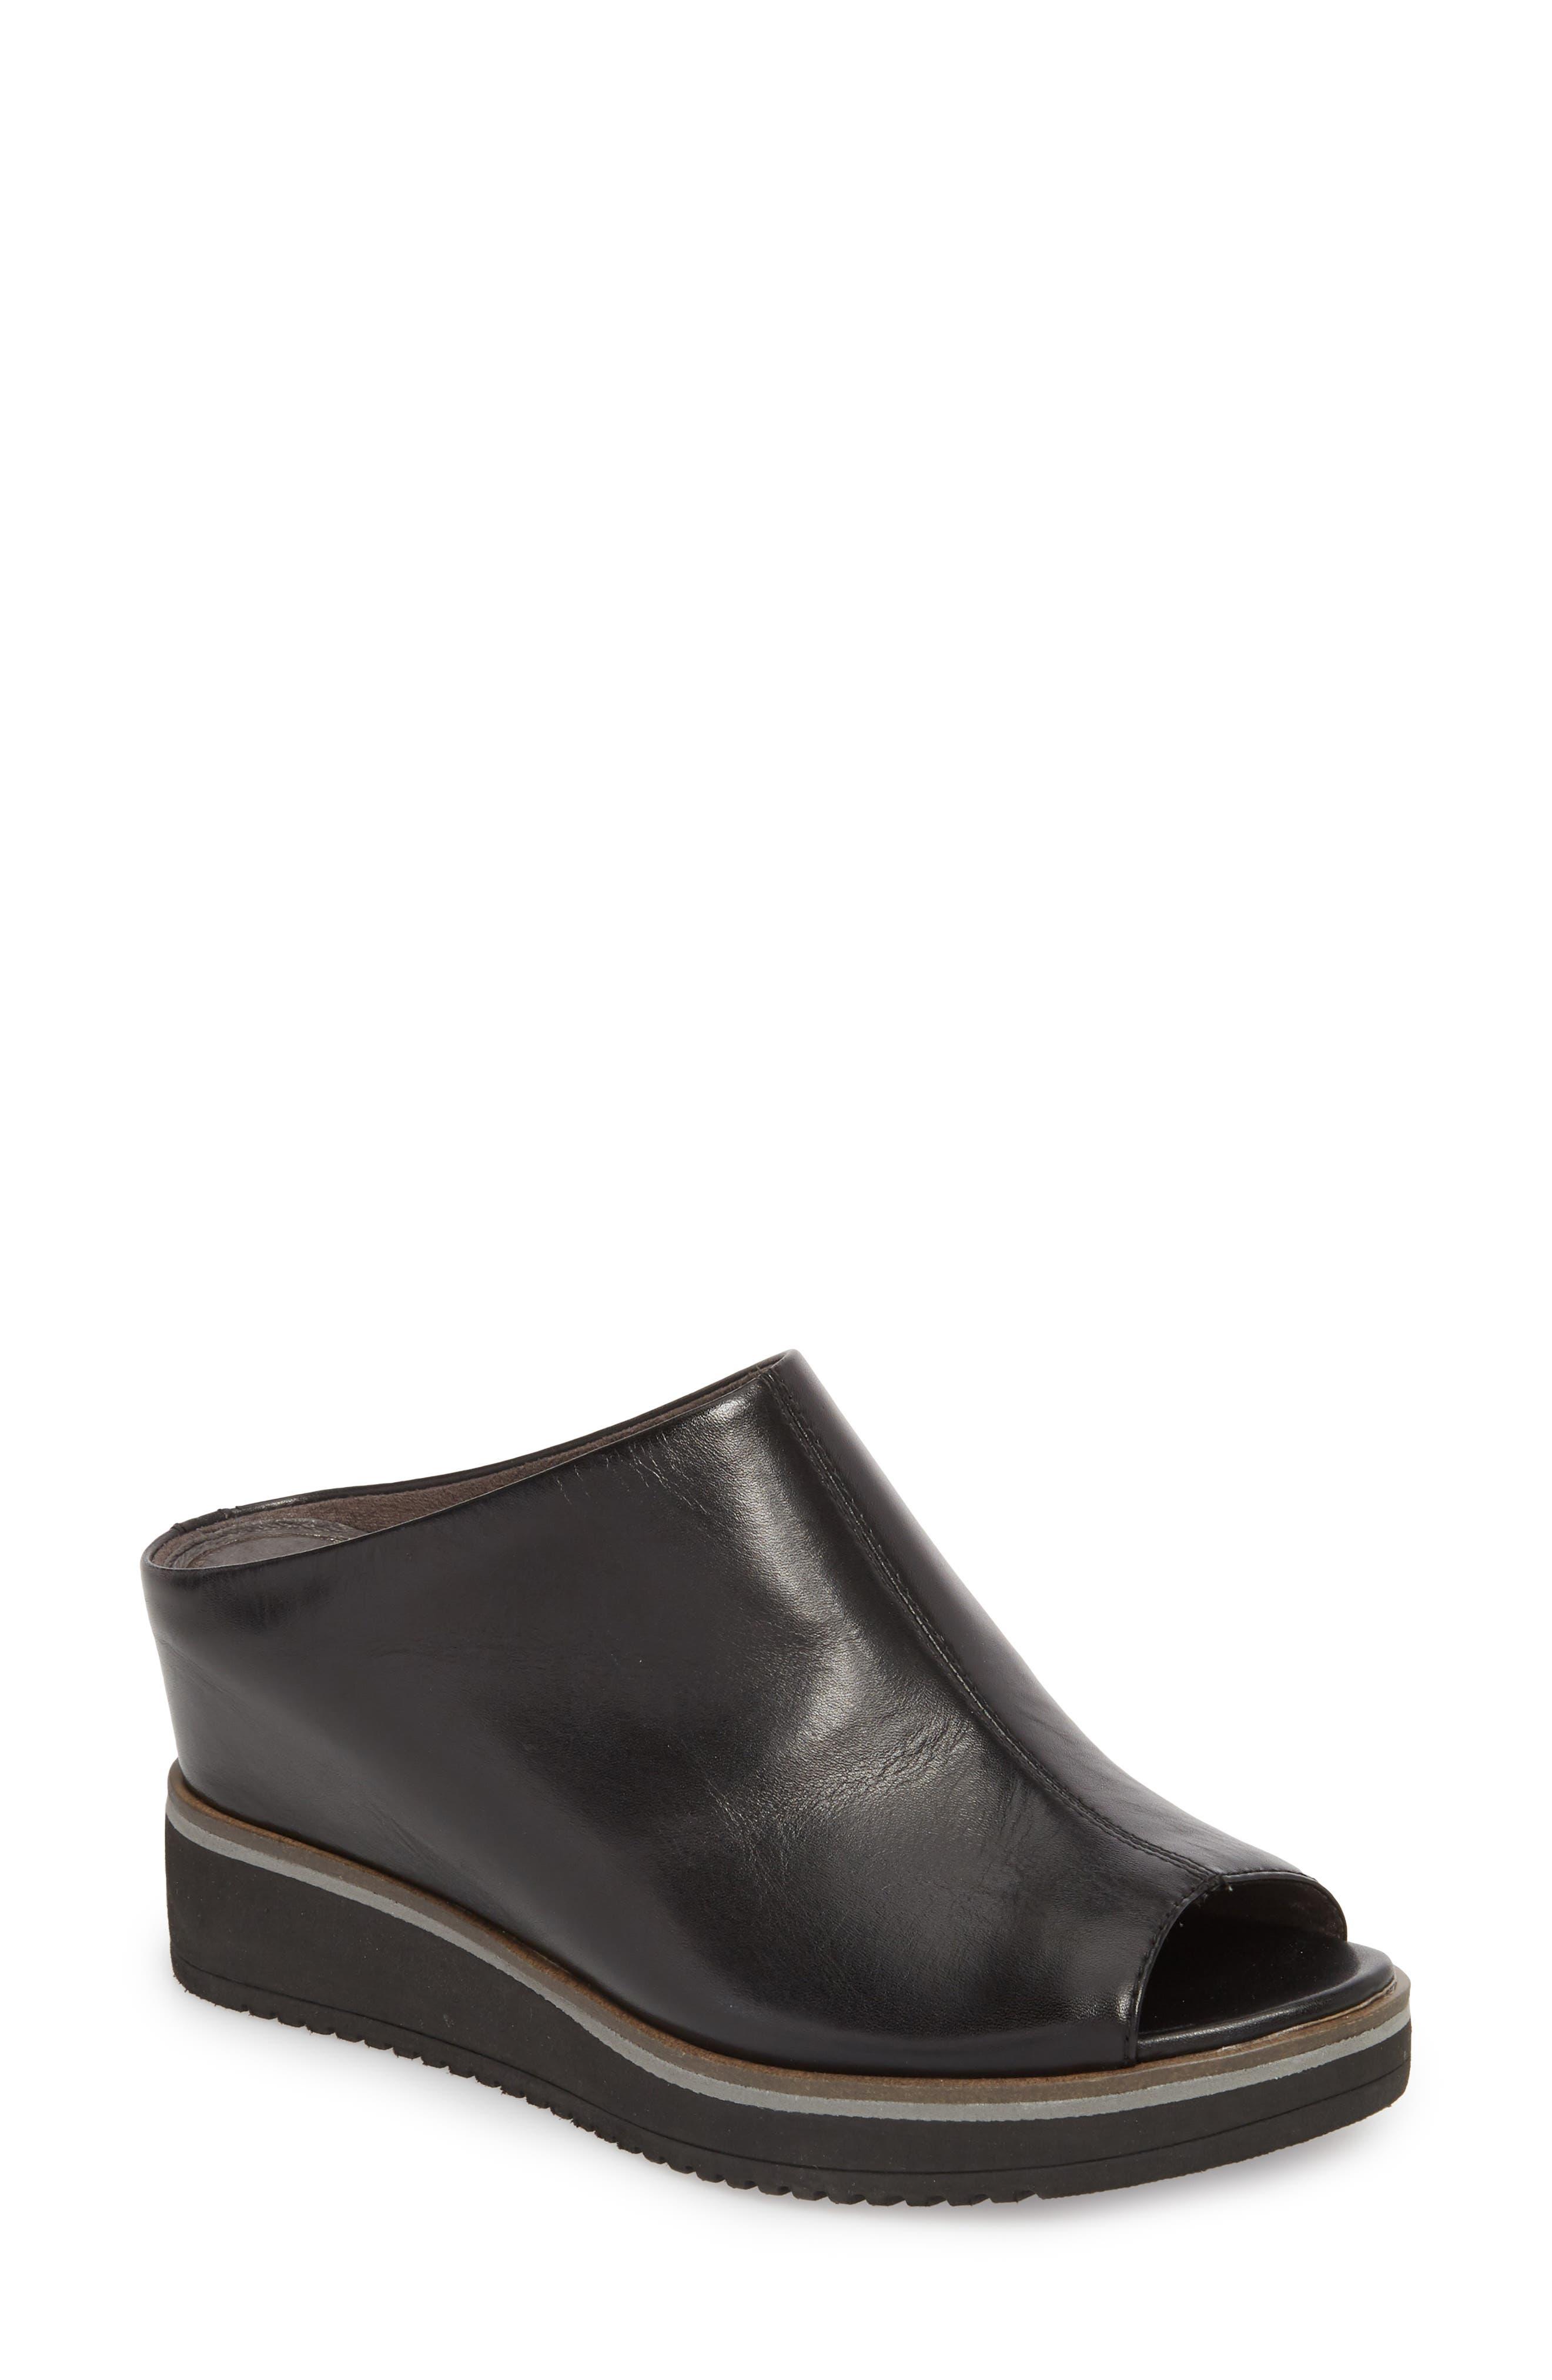 Alis Wedge Sandal,                             Main thumbnail 1, color,                             Black/ Black Leather